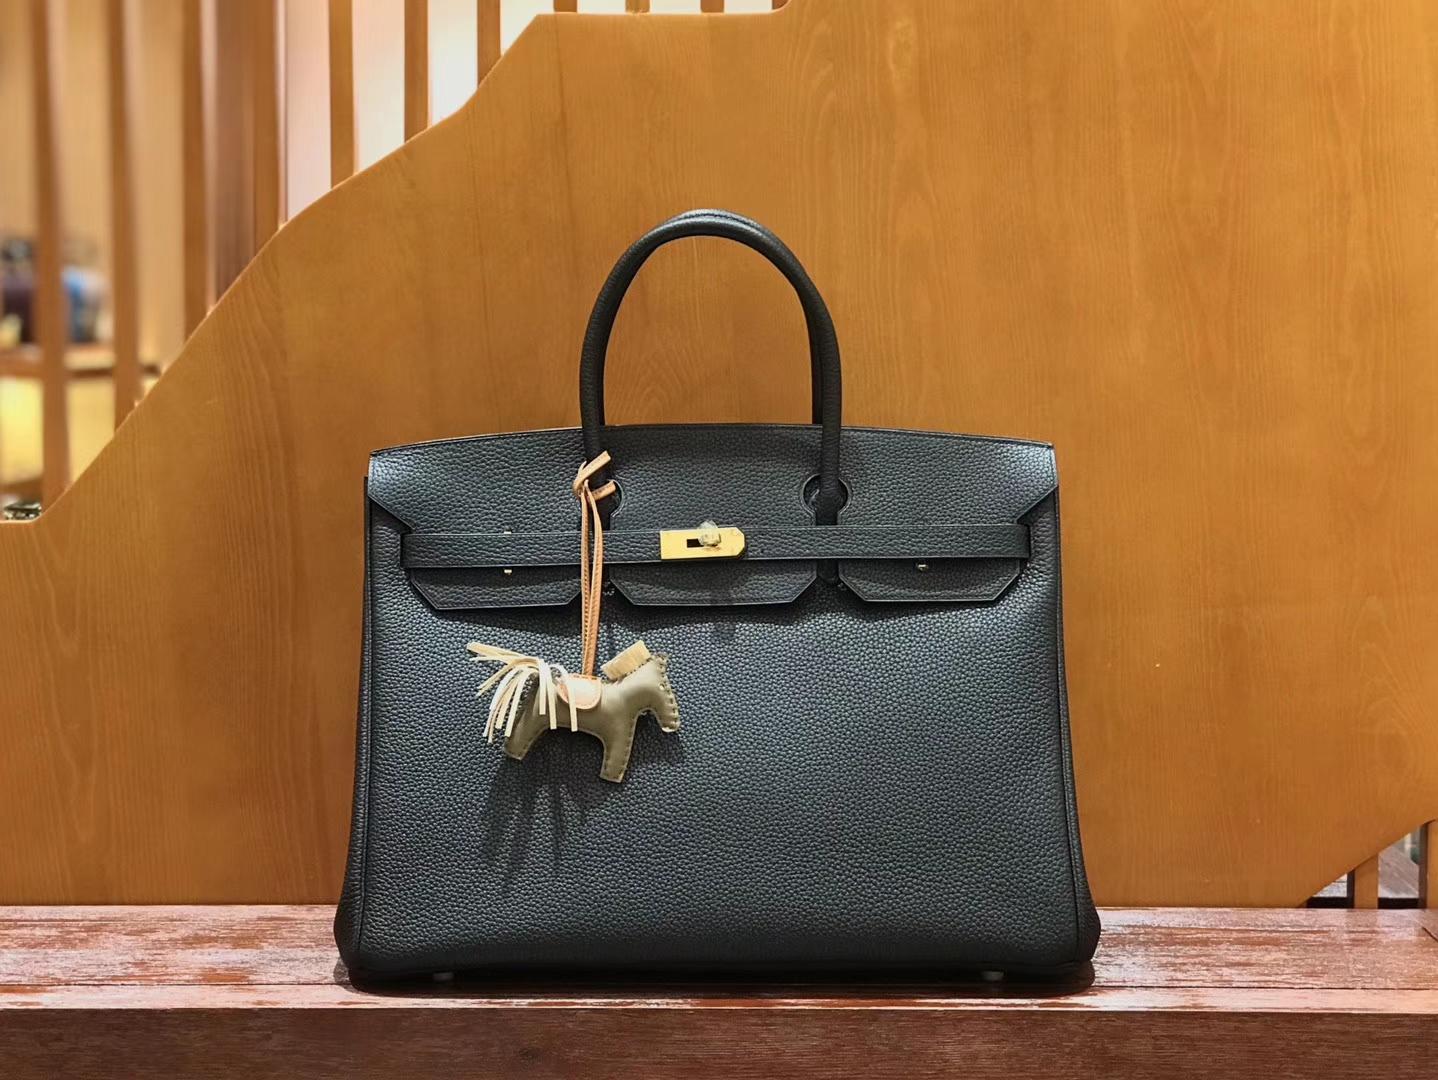 Hermès(爱马仕)Birkin 铂金包 经典黑 小牛皮 银扣 40cm 男士首选